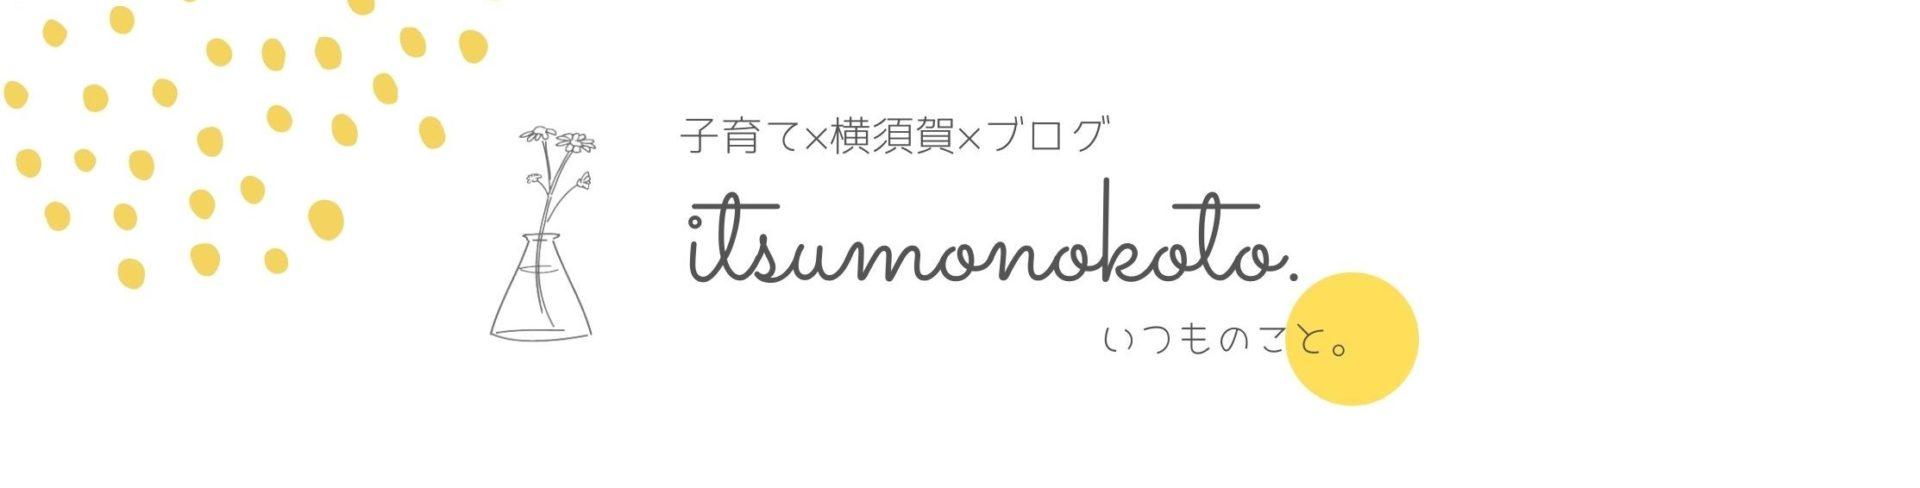 ITSUMONOKOTO.